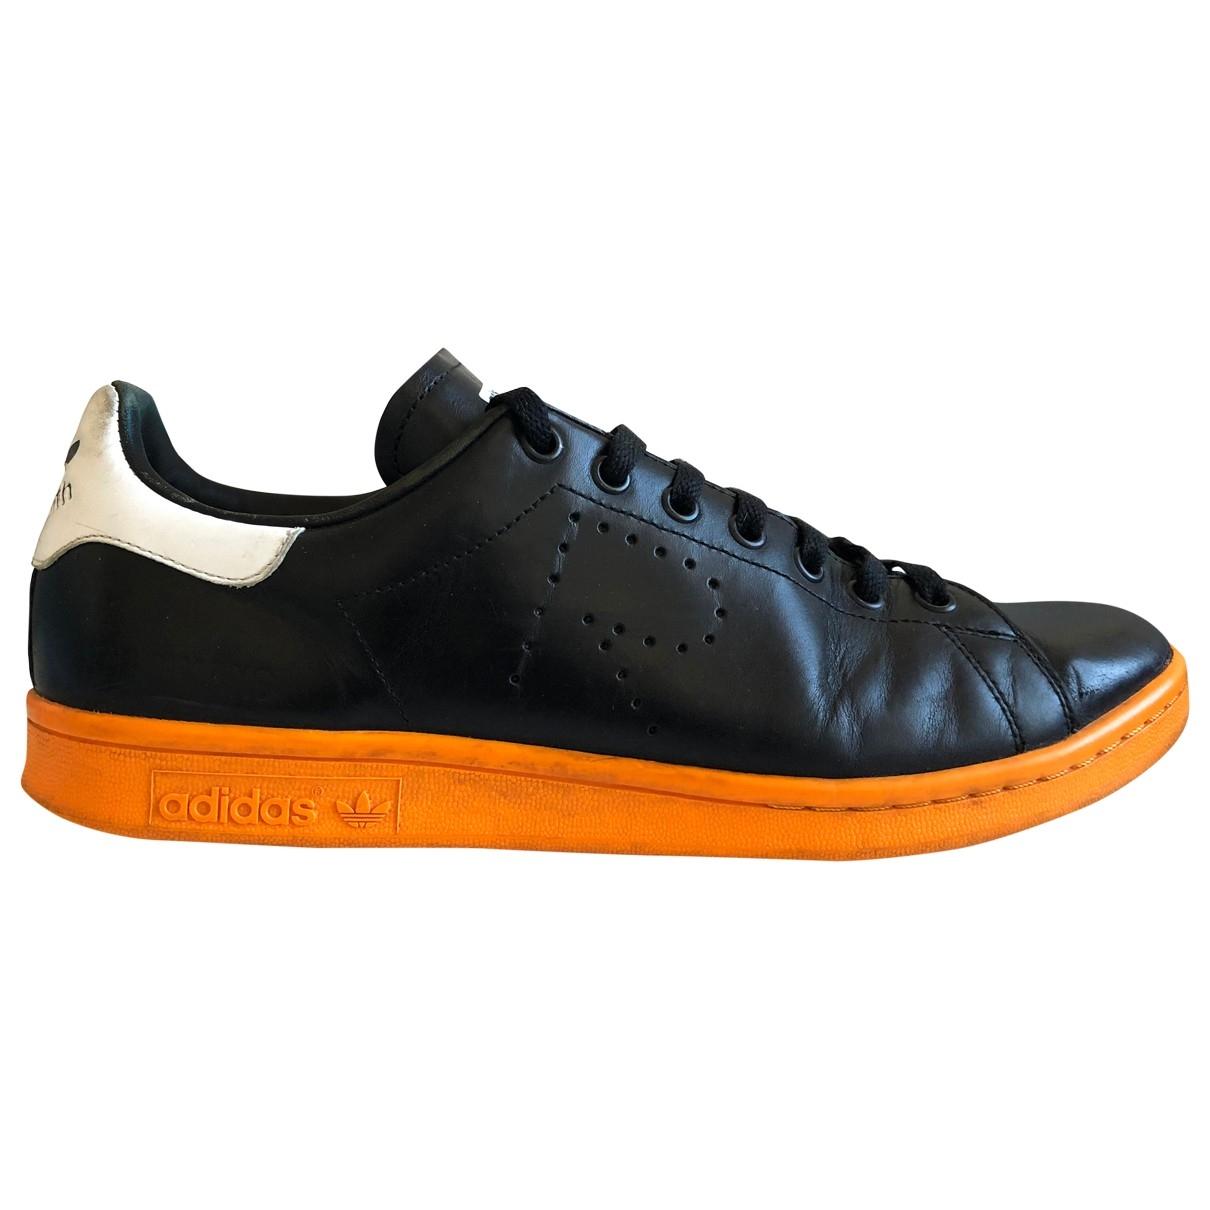 Adidas X Raf Simons Stan Smith Sneakers in  Schwarz Leder